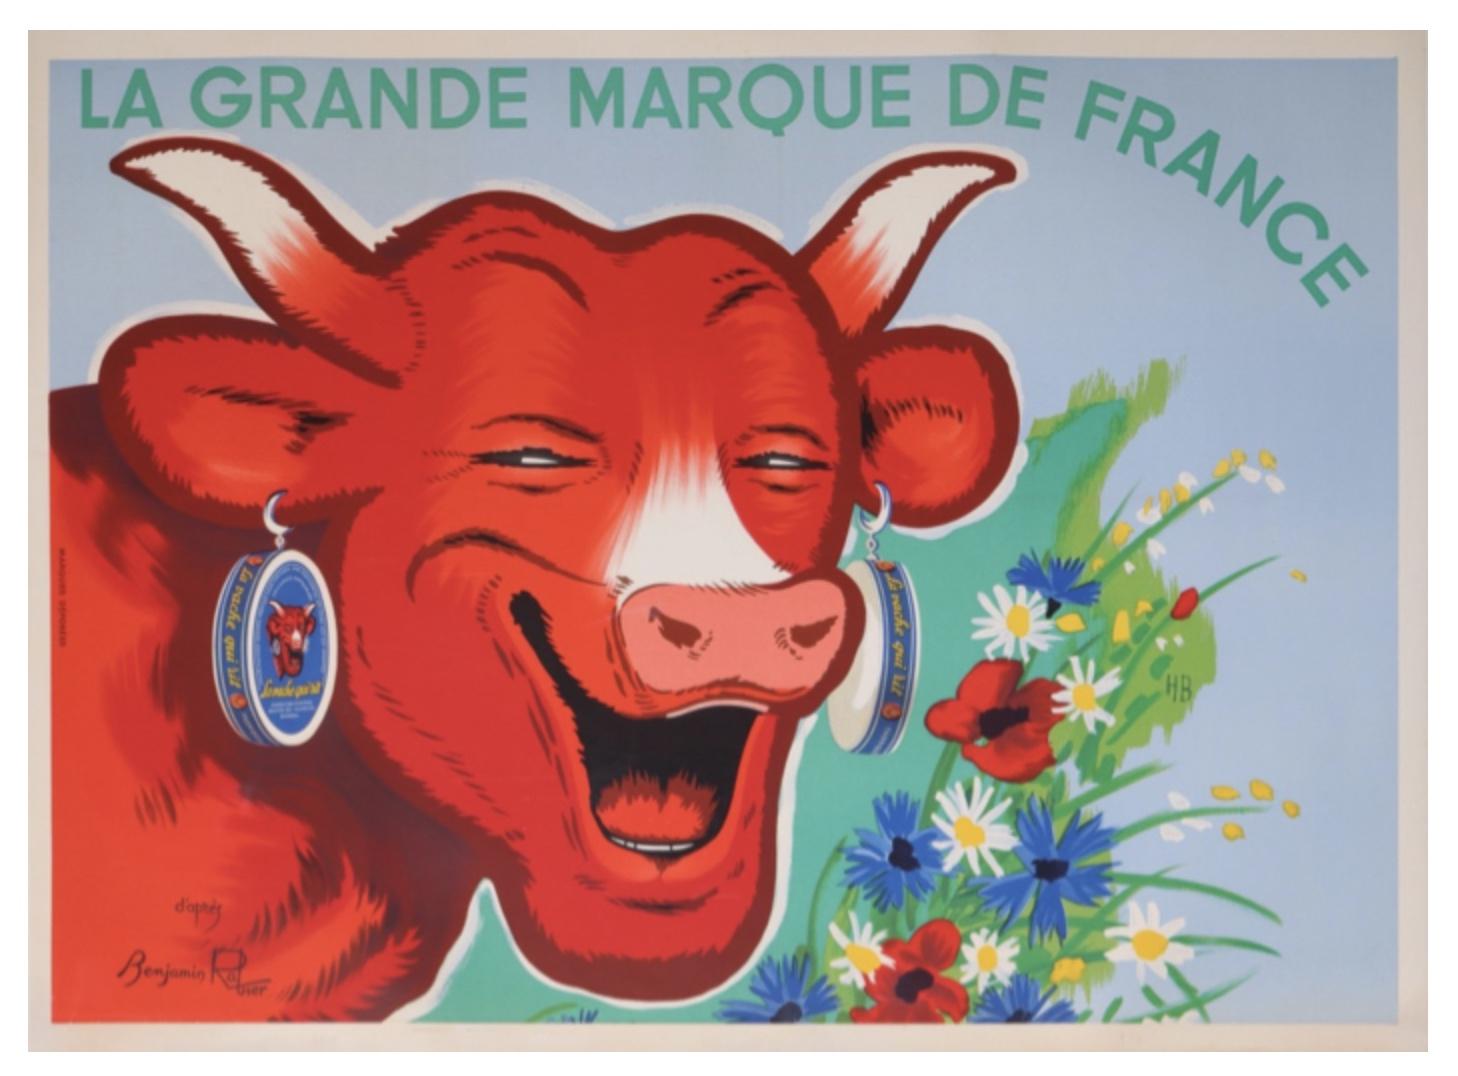 La Vache Qui Rit La Grande Marque Francaise Original Vintage Poster